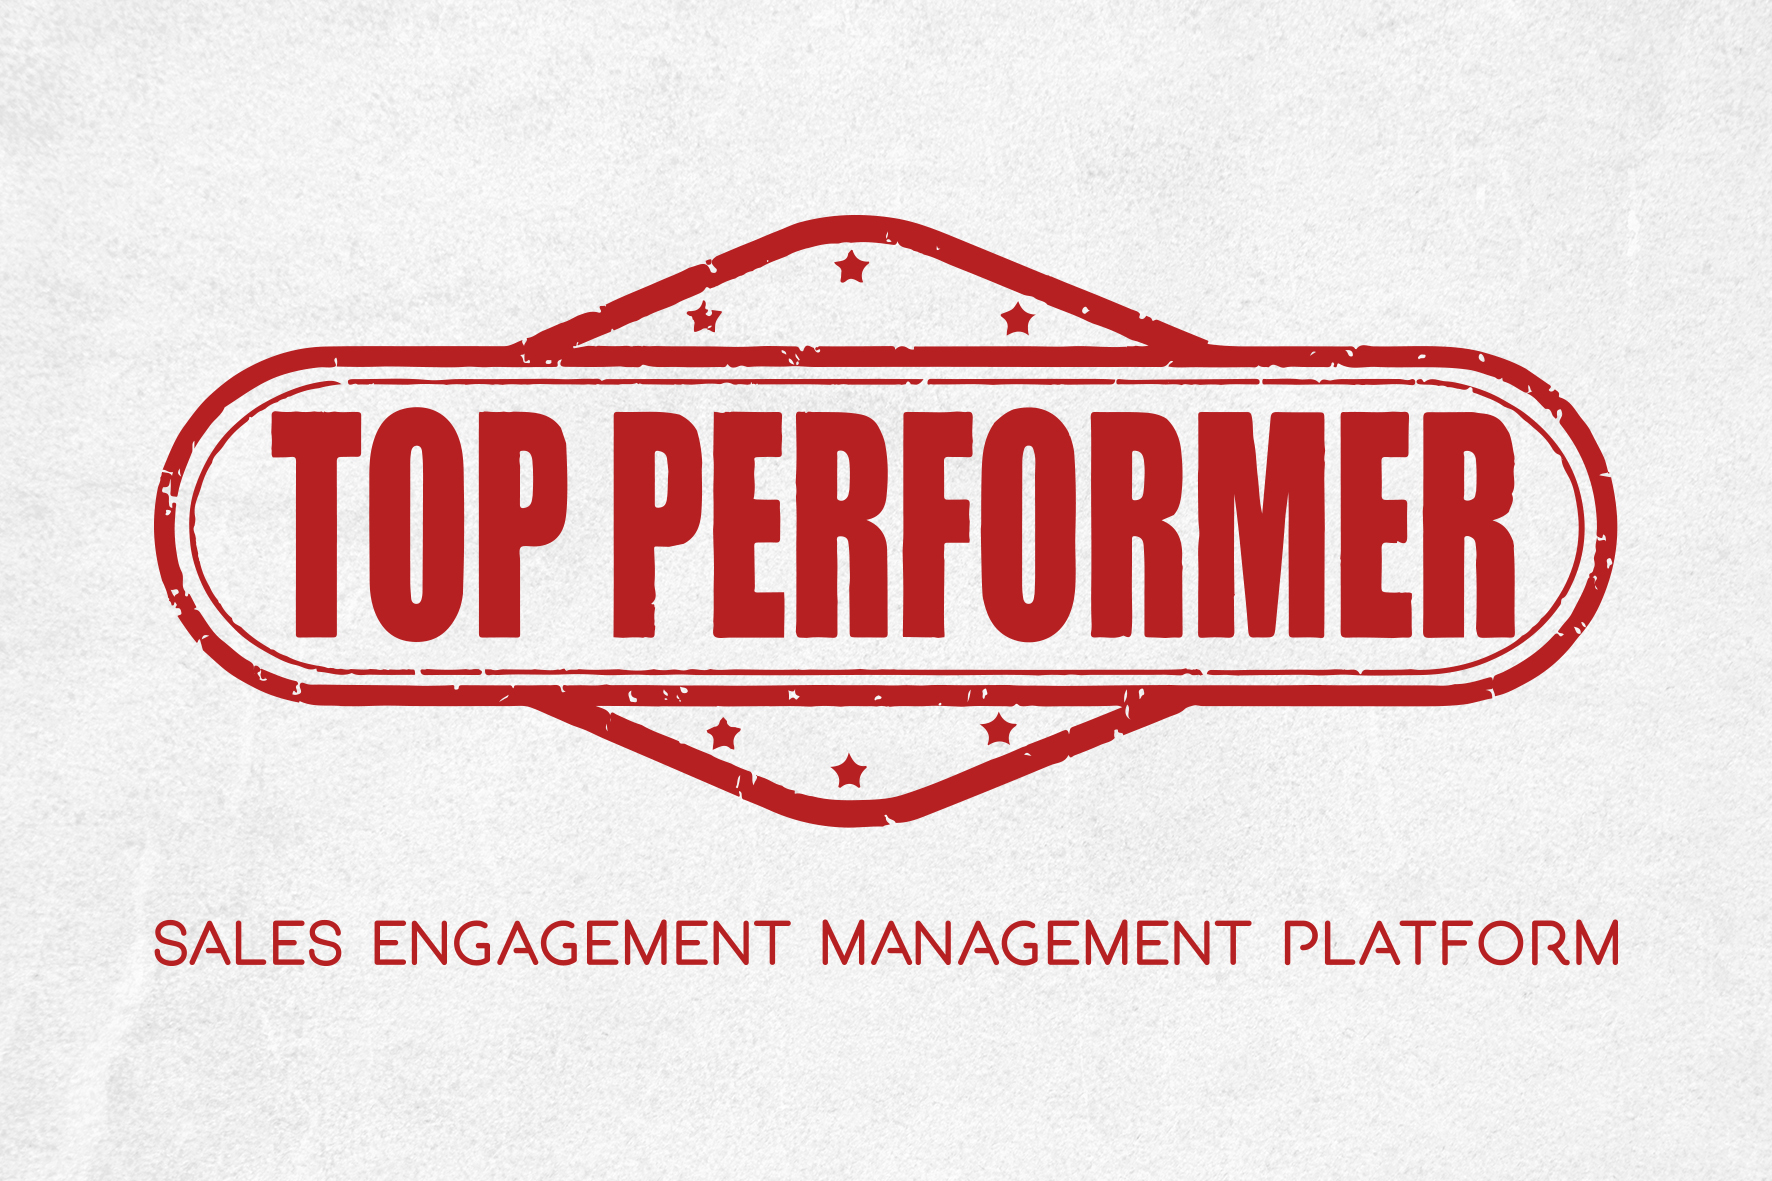 Top-Performer